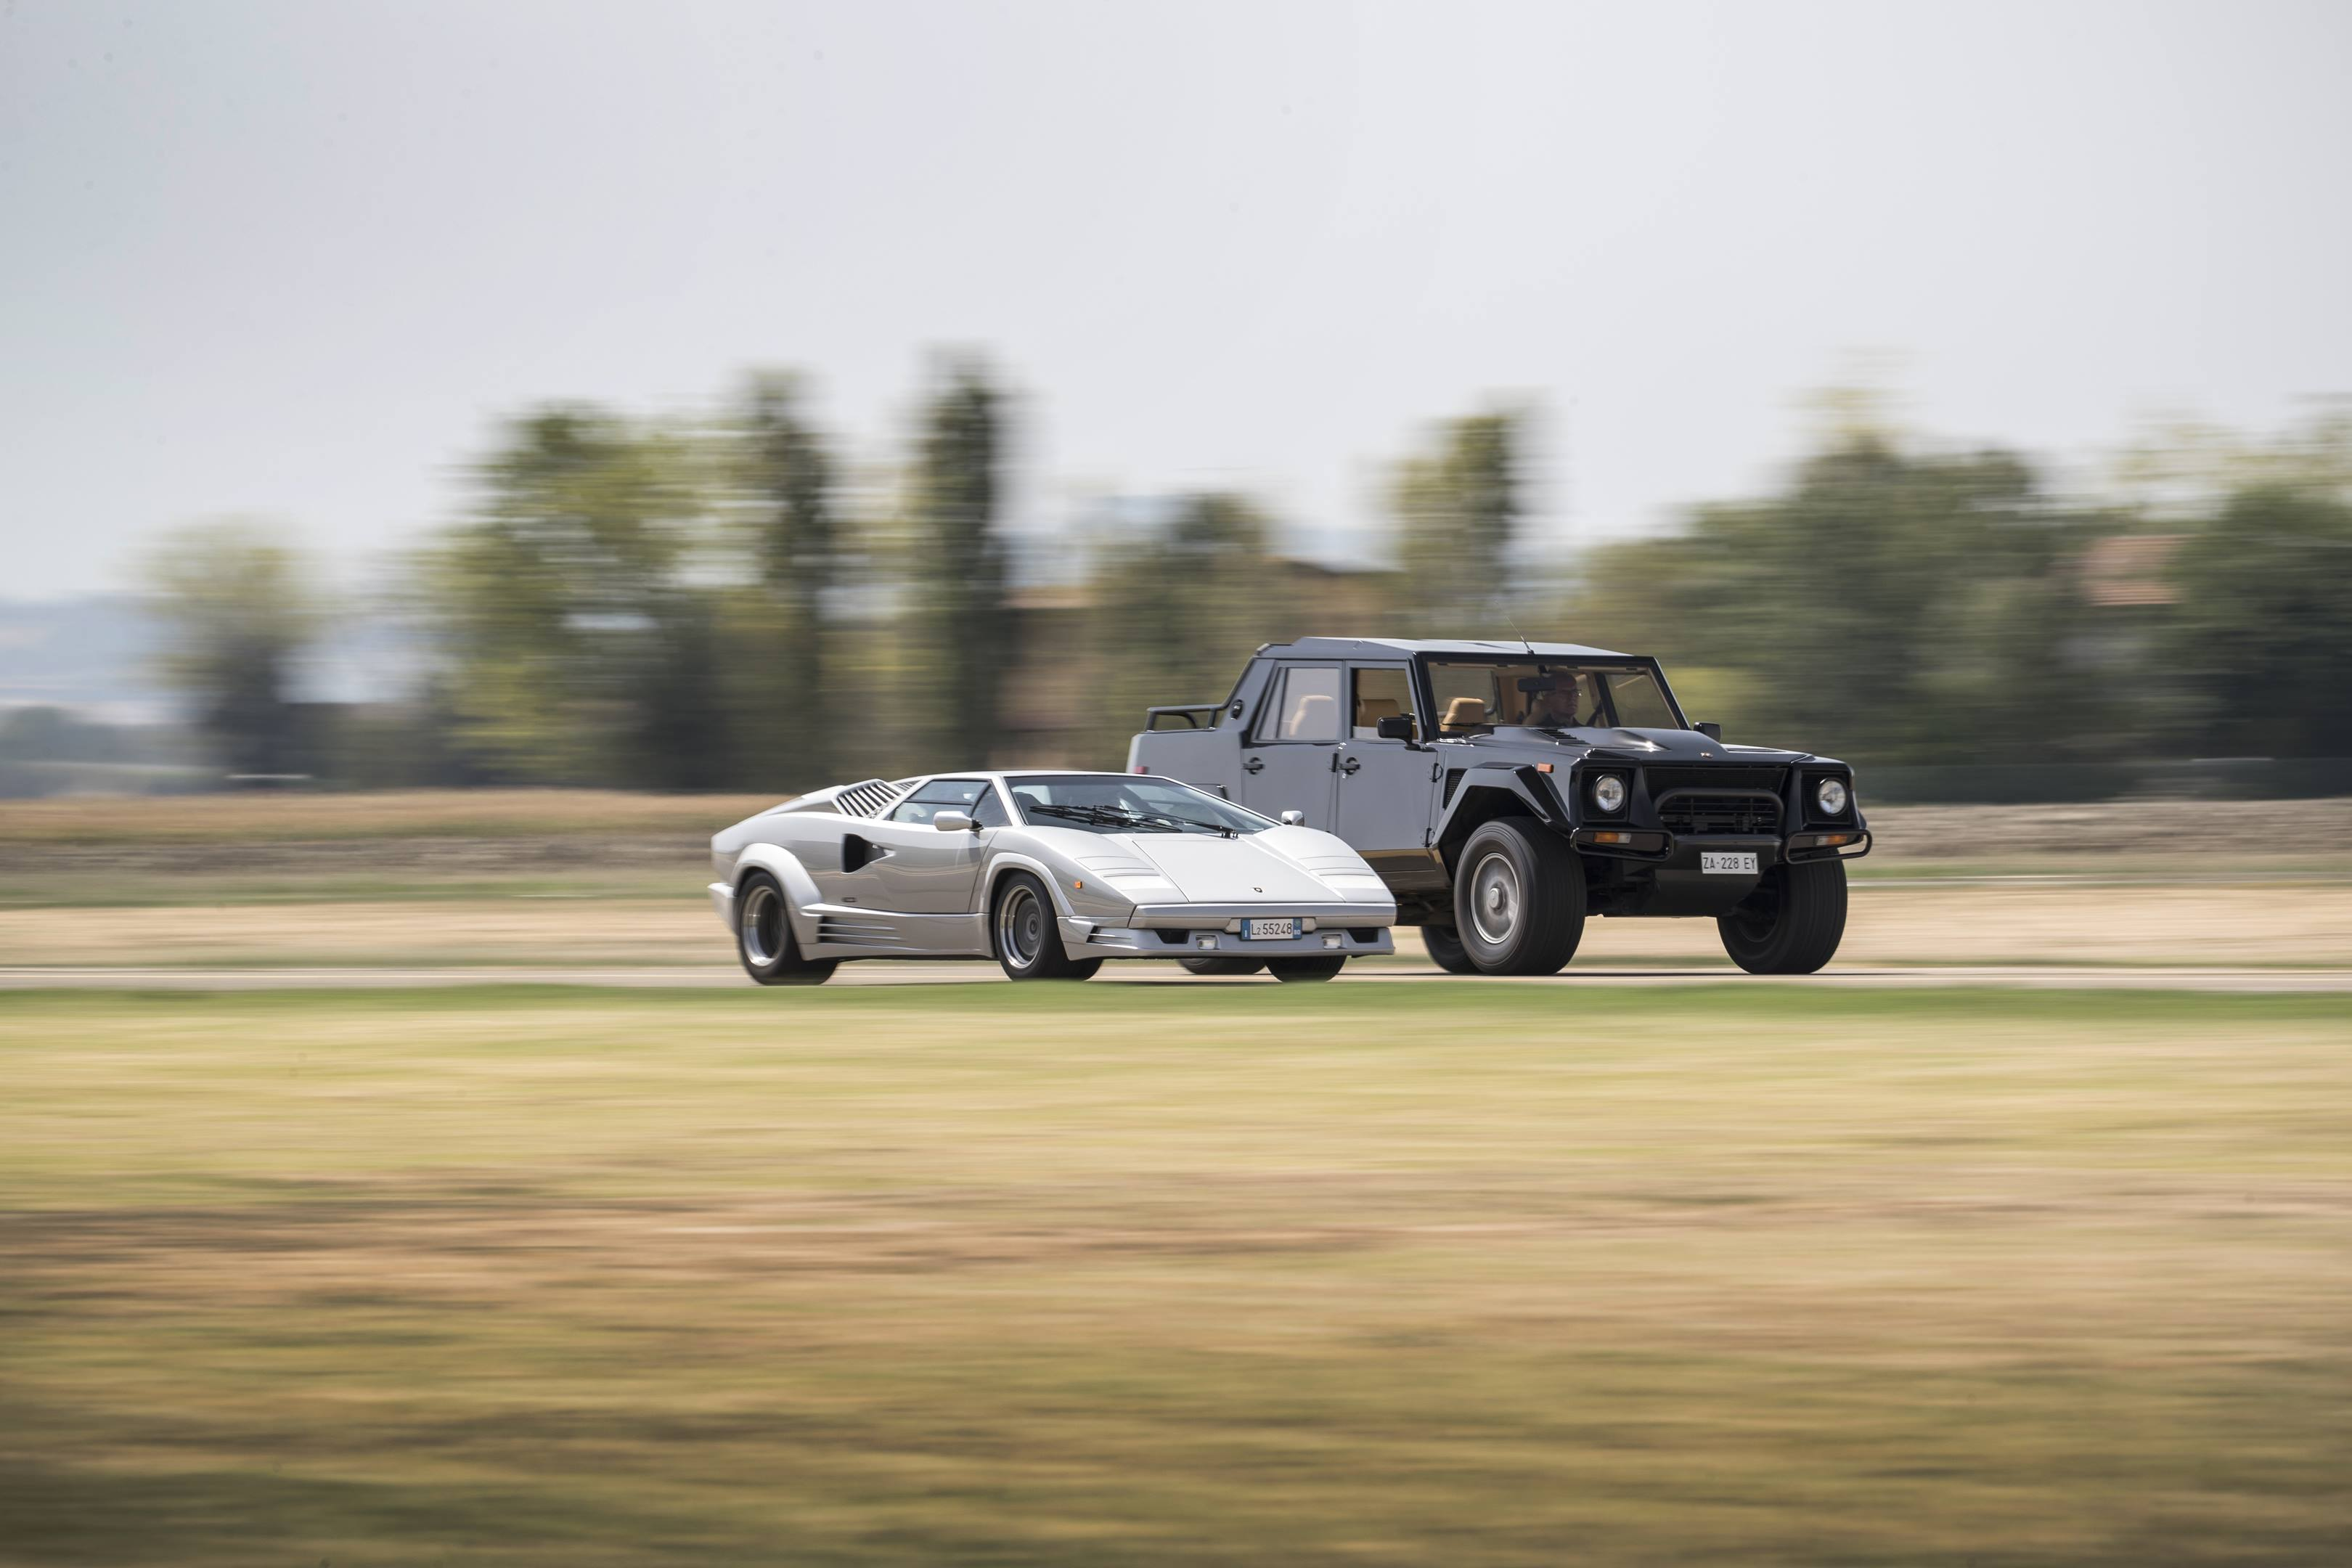 The Lamborghini LM002 shared the same engine as the Countach